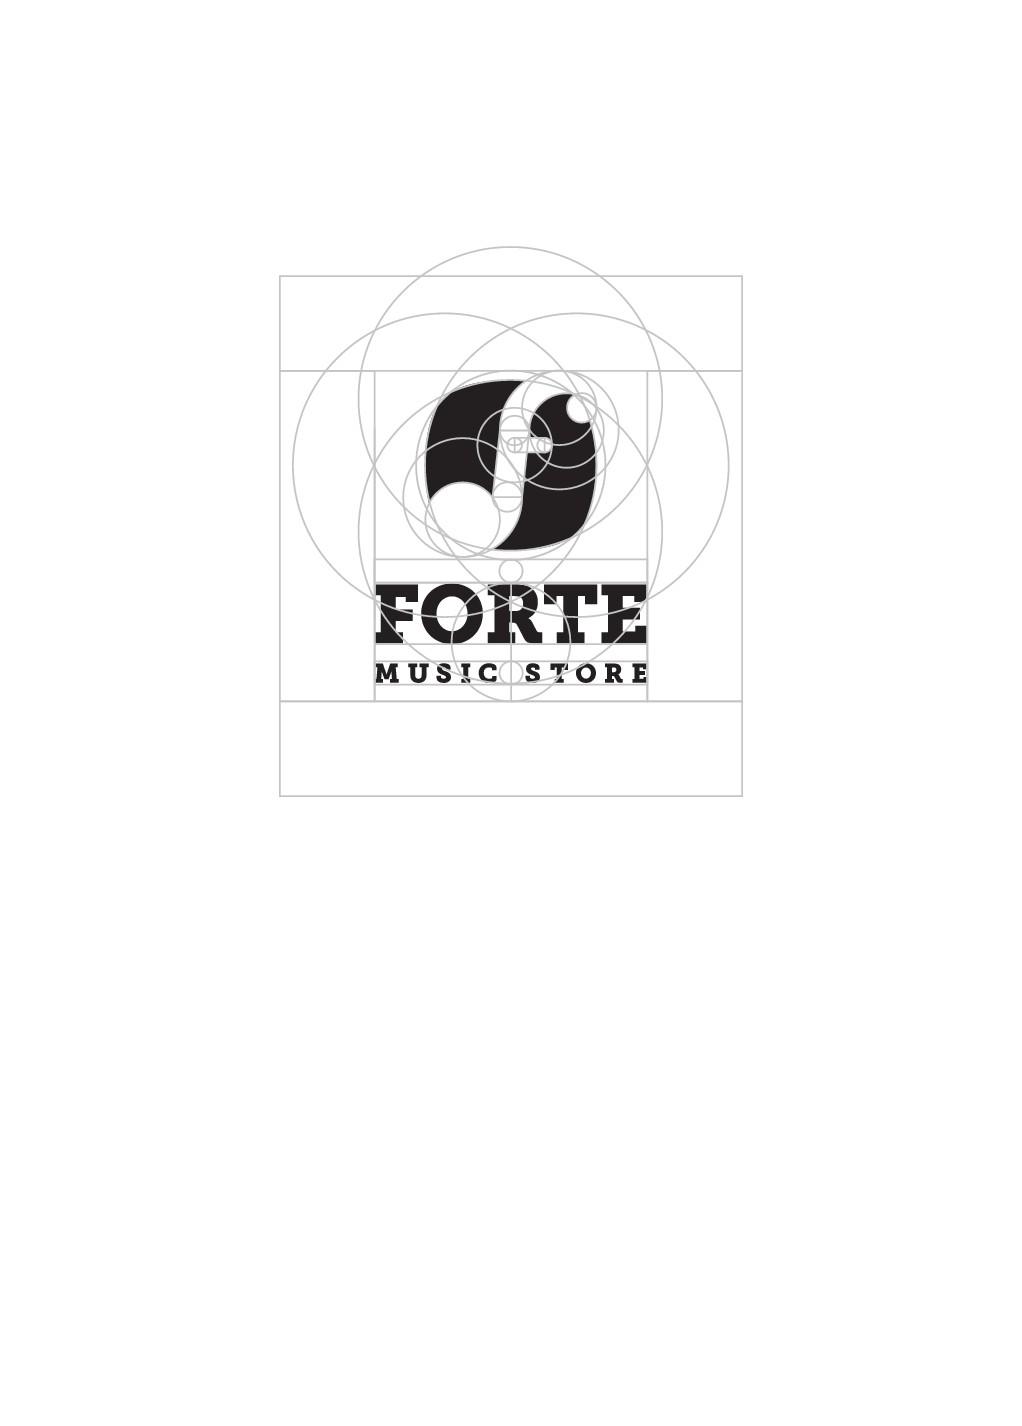 Design a modern-vintage logo for Forte Music Store